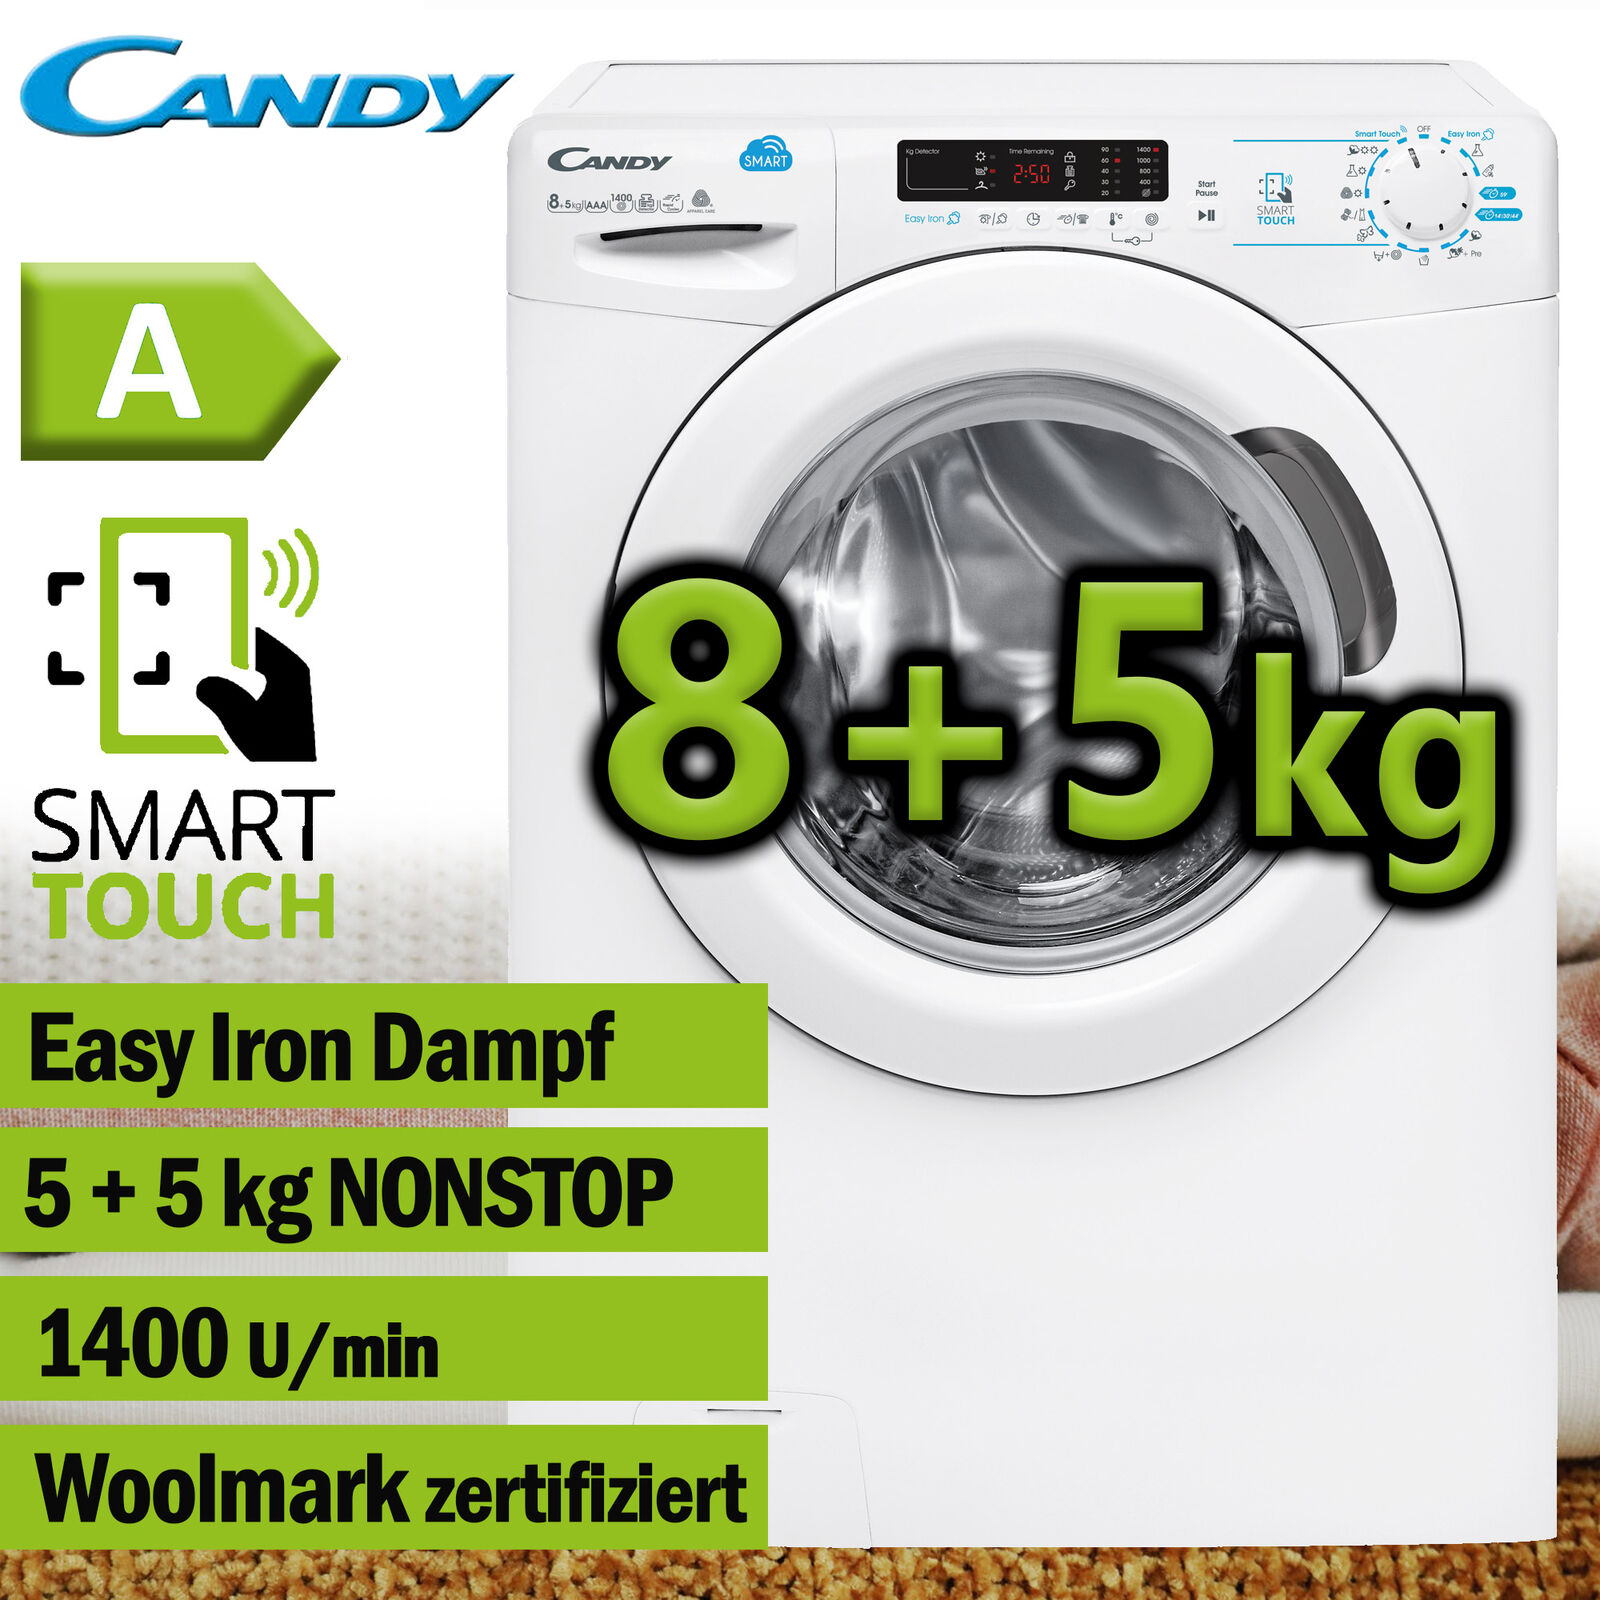 Waschtrockner Waschmaschine Wäschetrockner Trockner 8+5kg Dampf NFC Candy Hoover